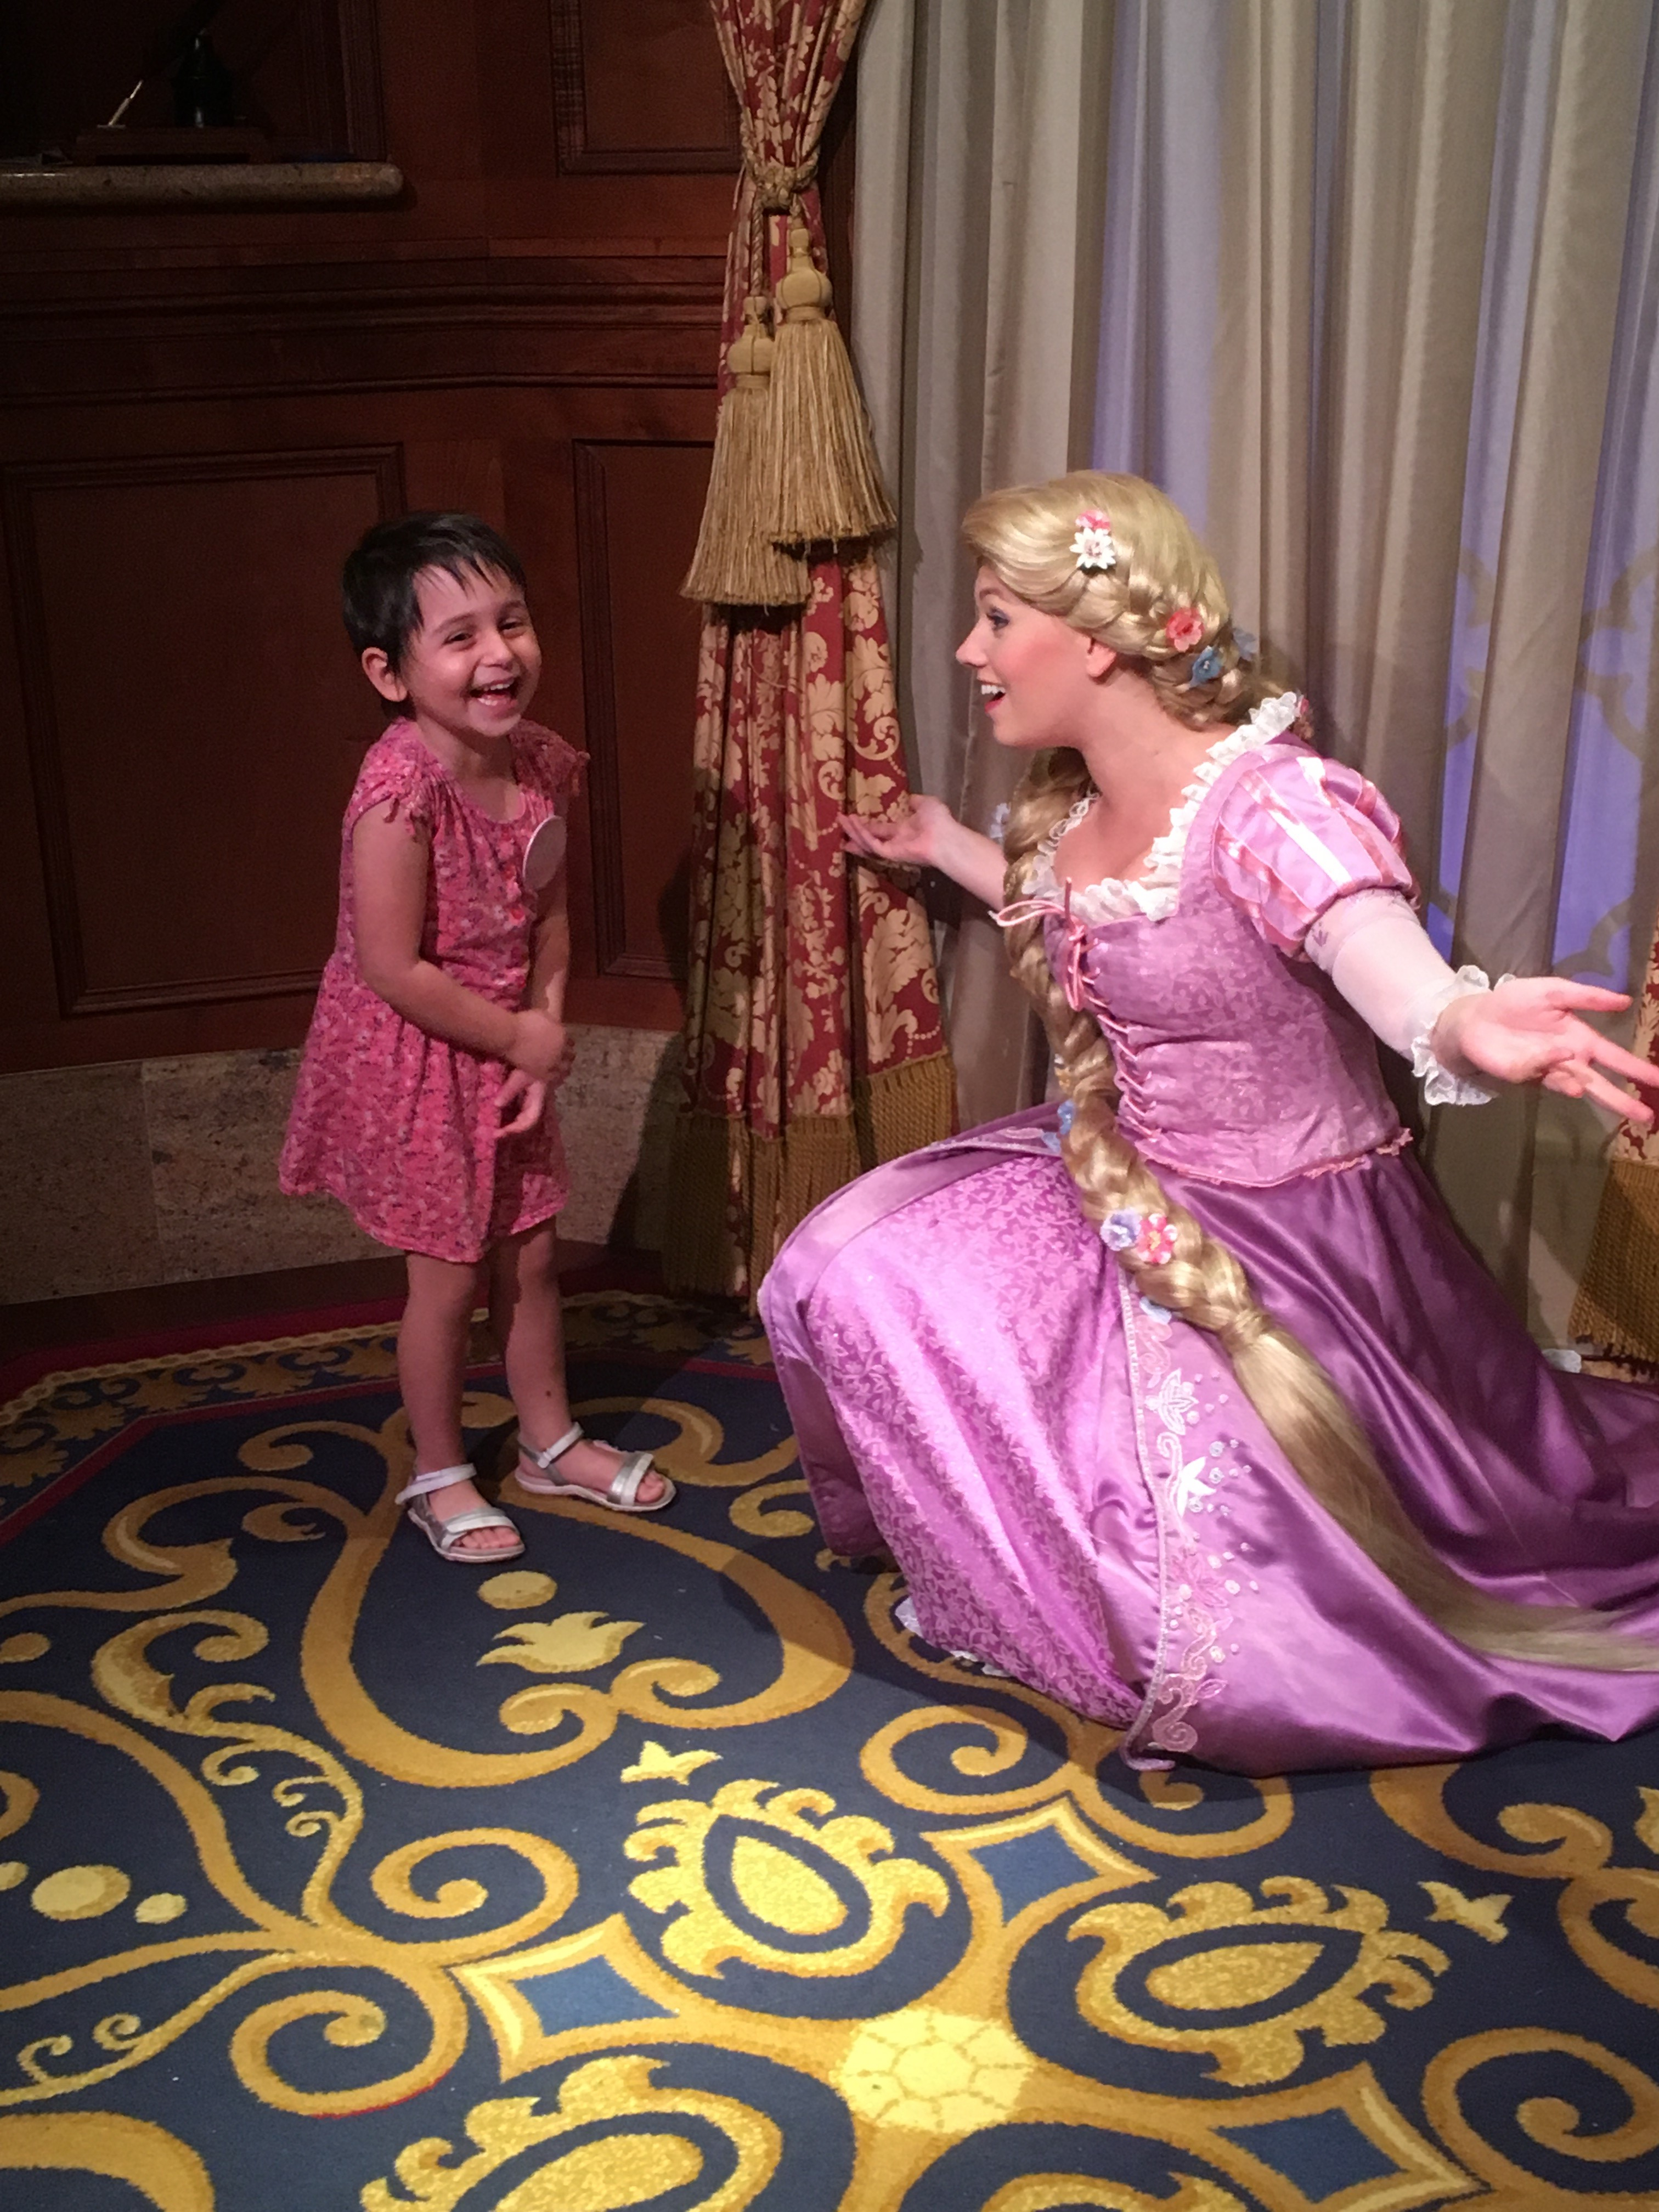 12. Princesses